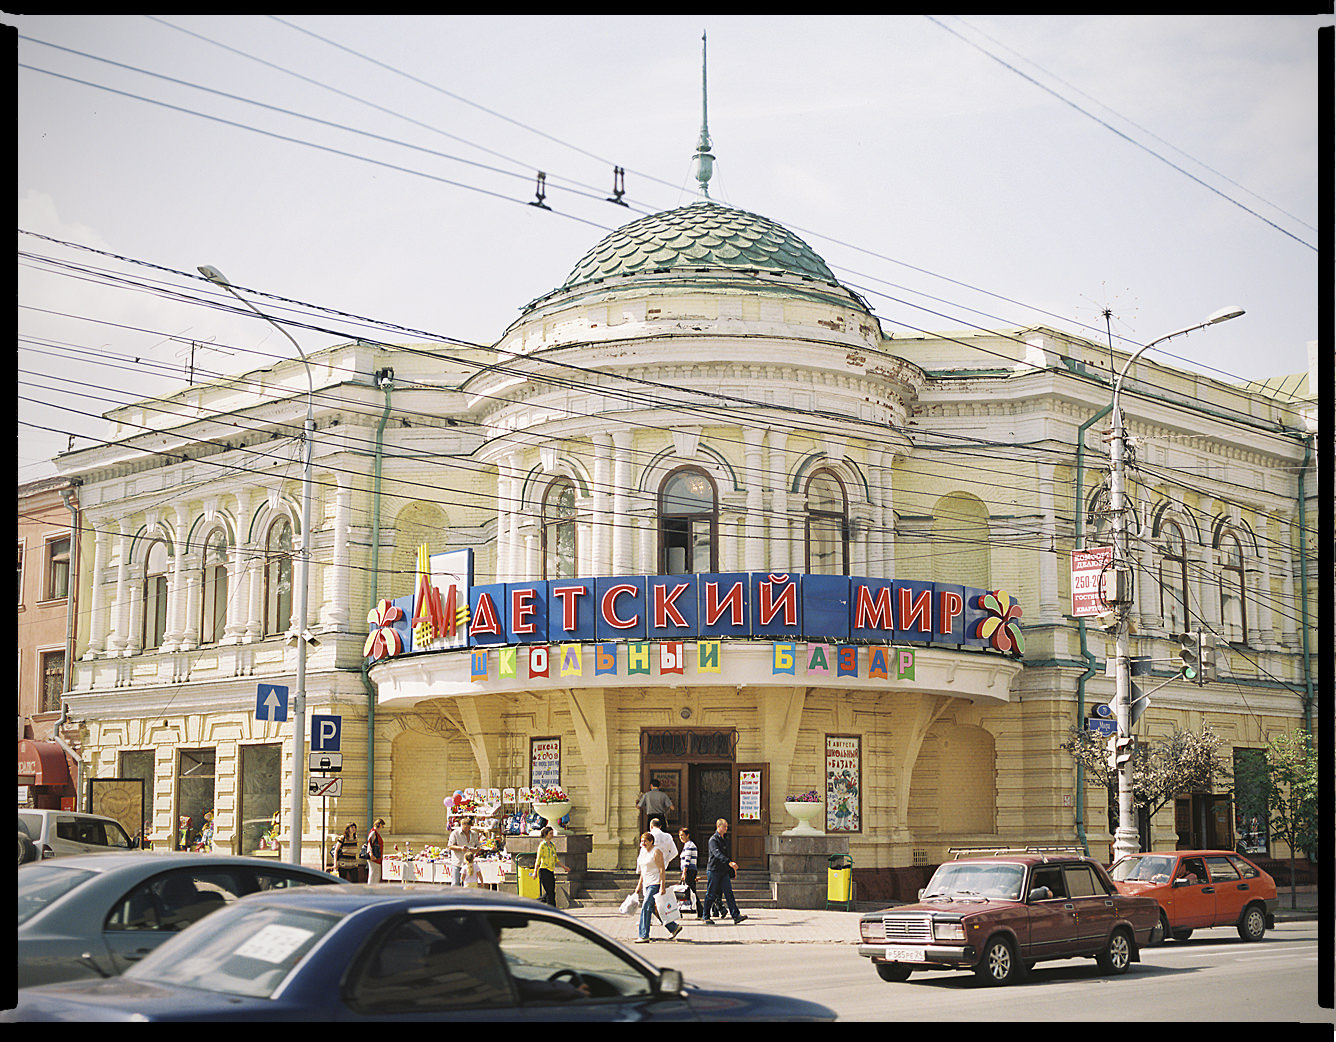 MediumFormatPatrikWallner_Krasnoyarsk_ToyStoreLOWQ